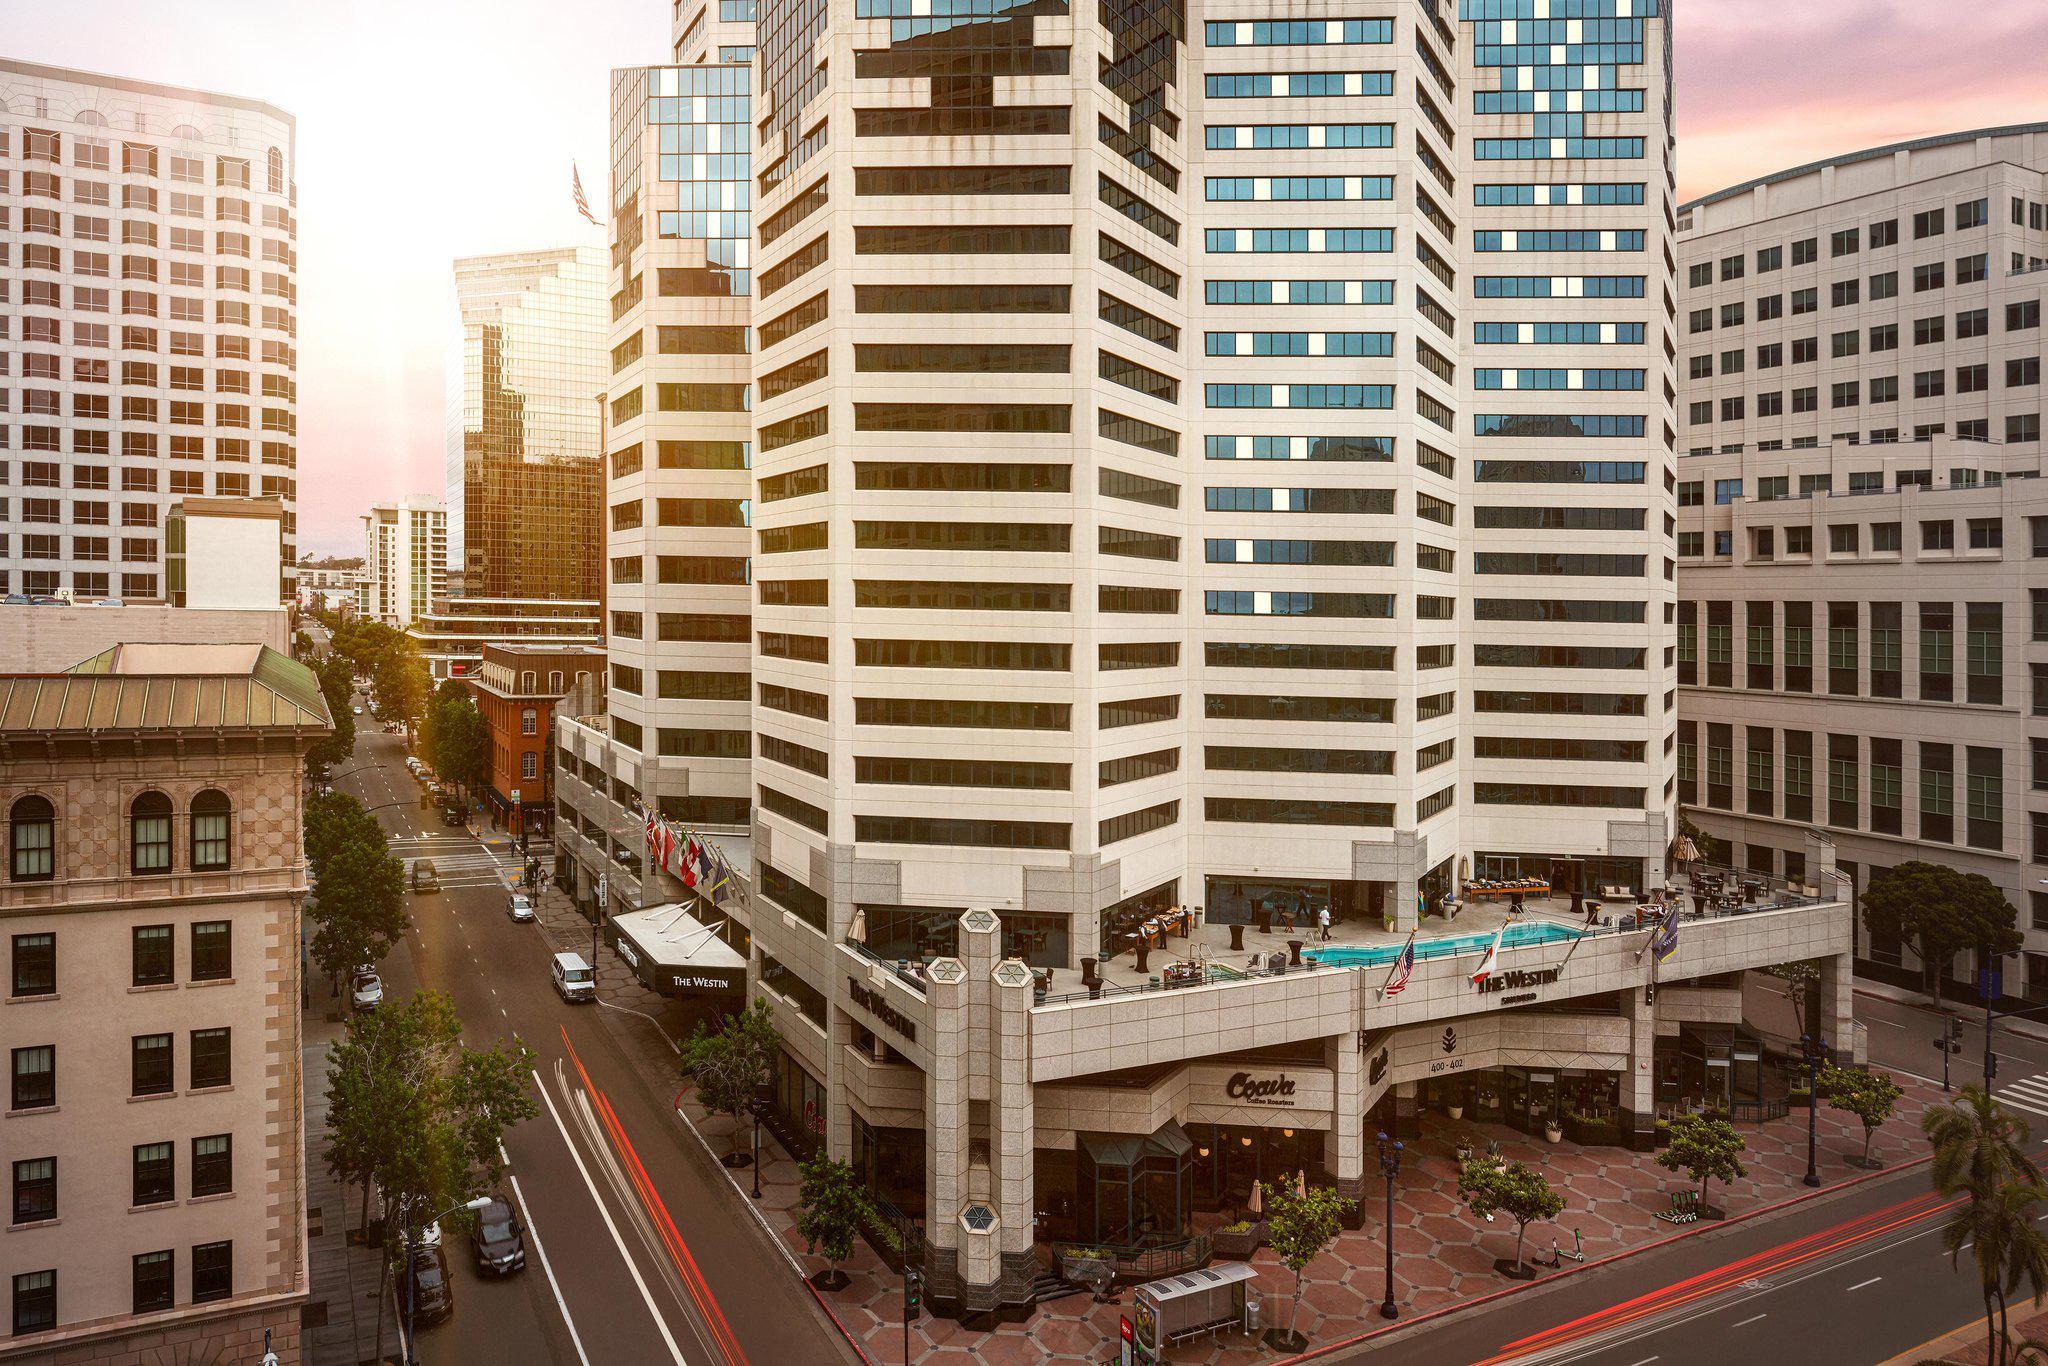 The Westin San Diego Downtown